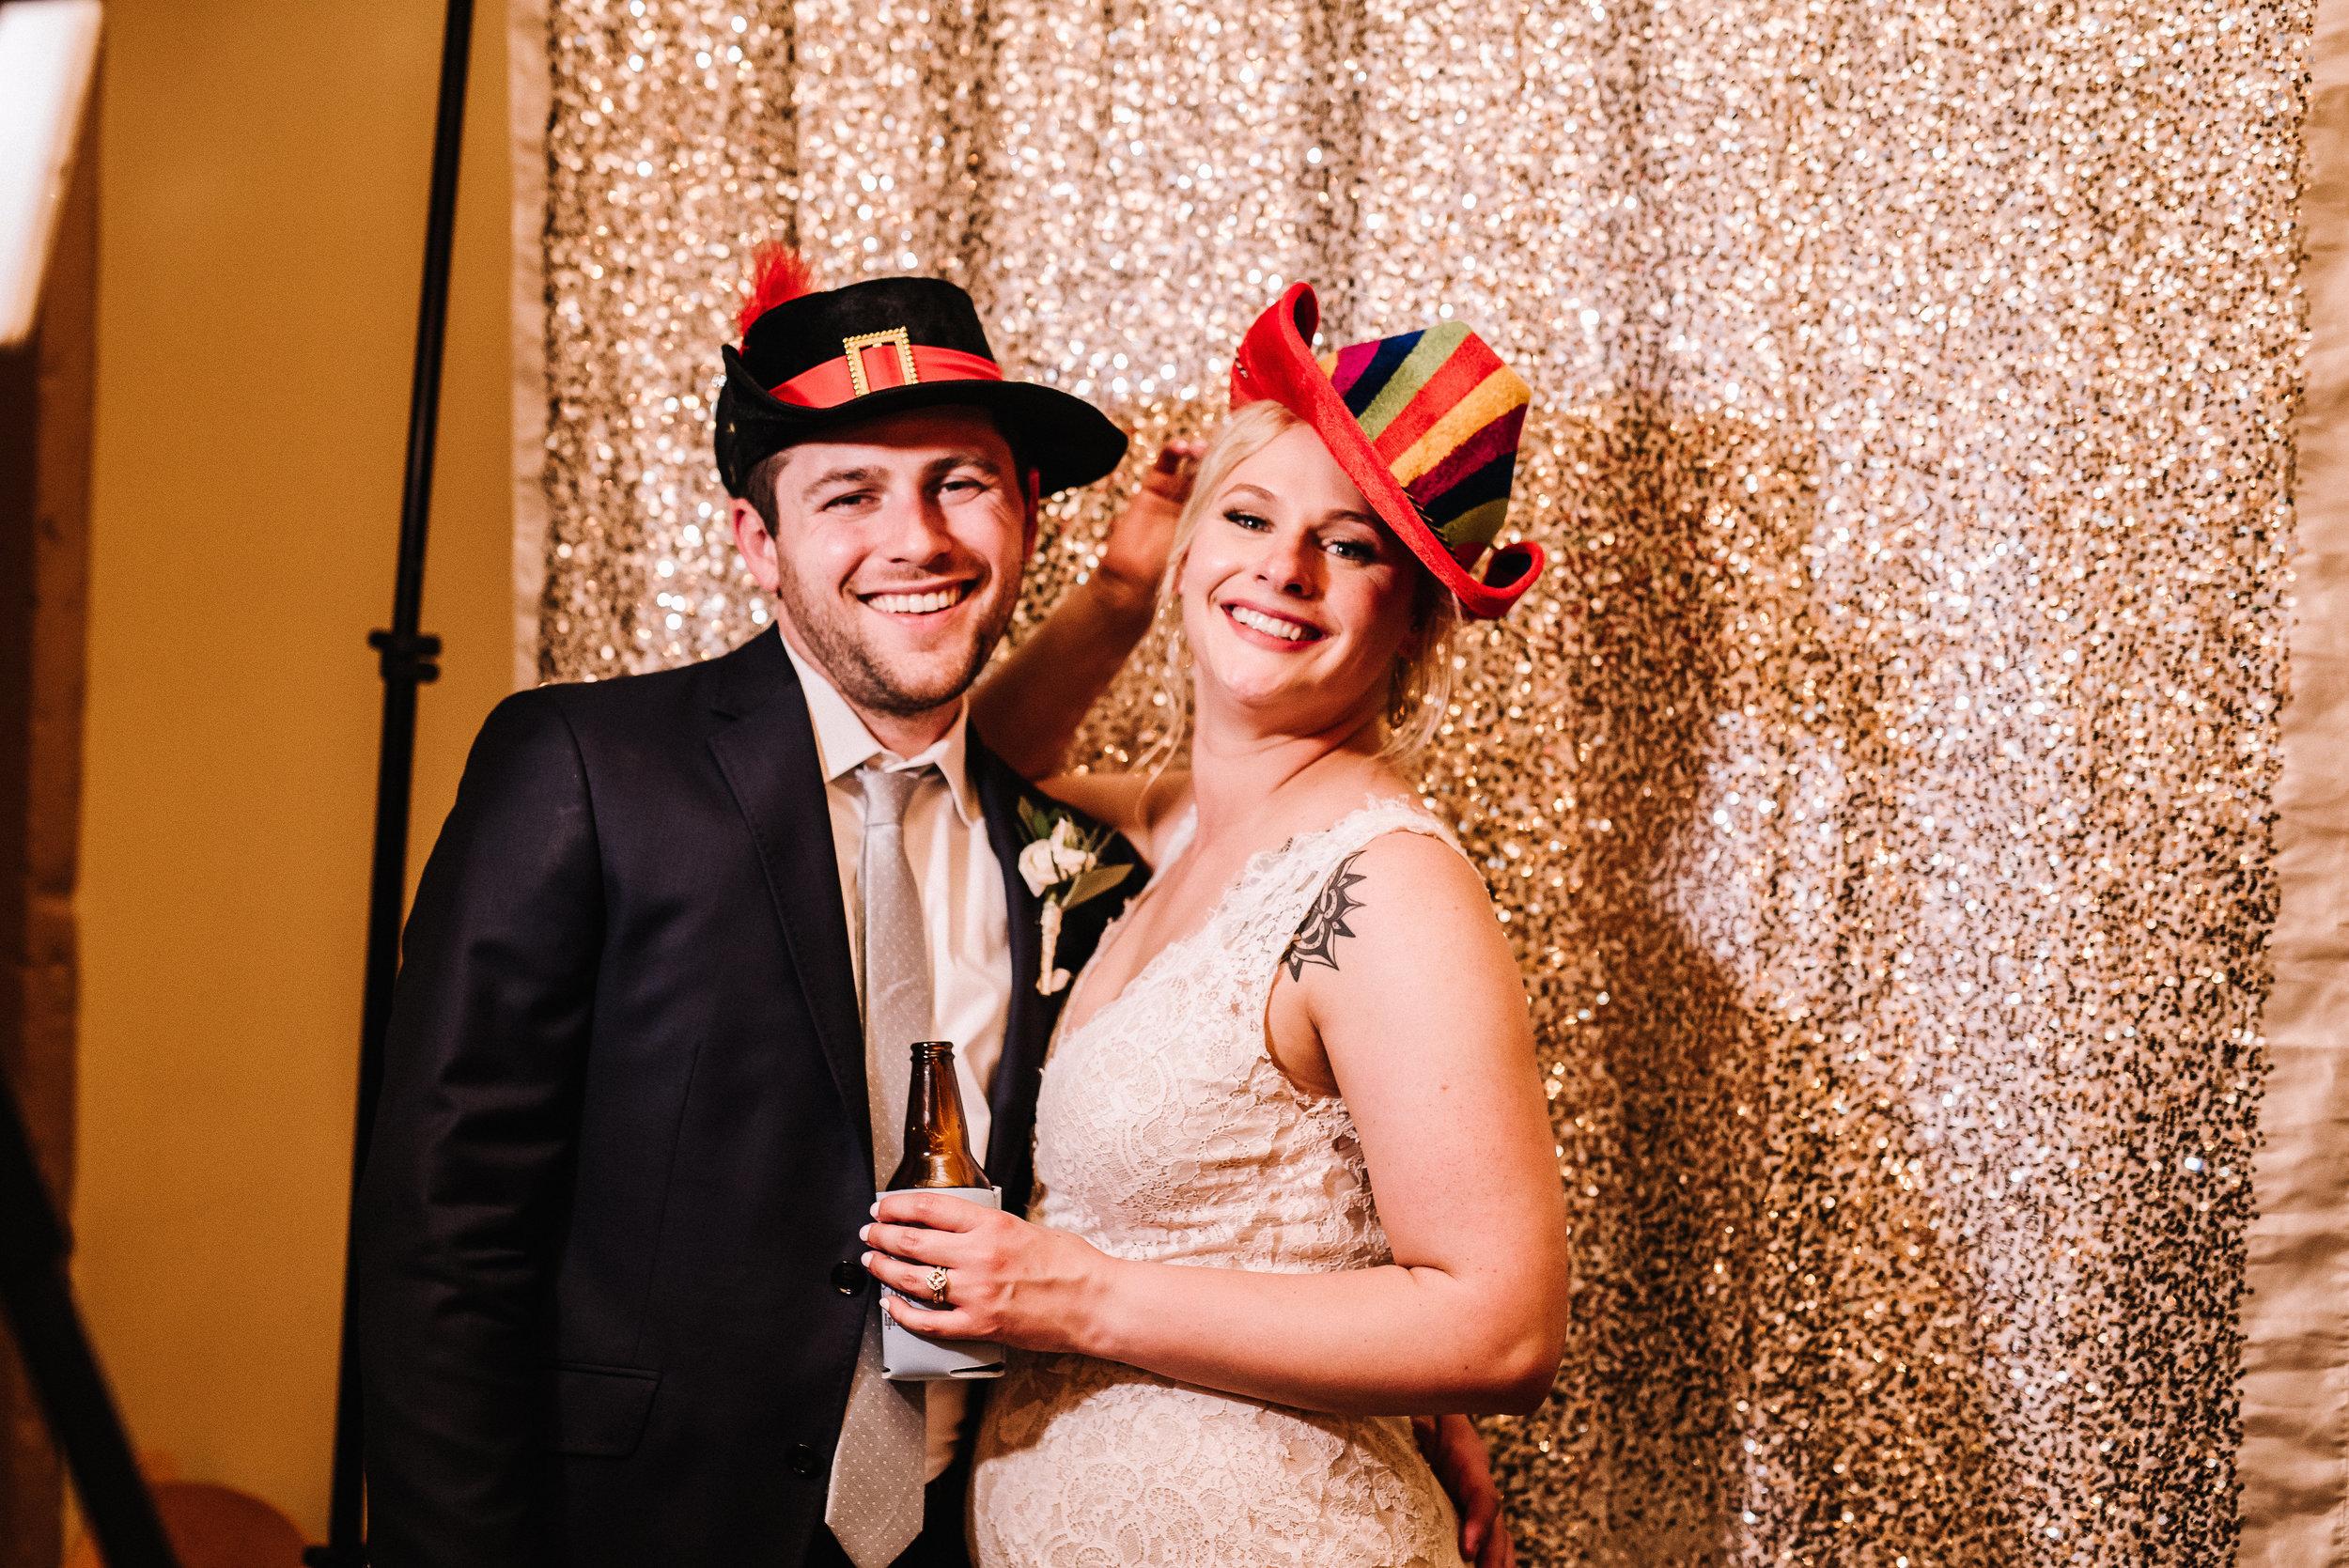 Morgan Wedding_Mill at Yellow River_Ashley Benham Photography-1245.jpg